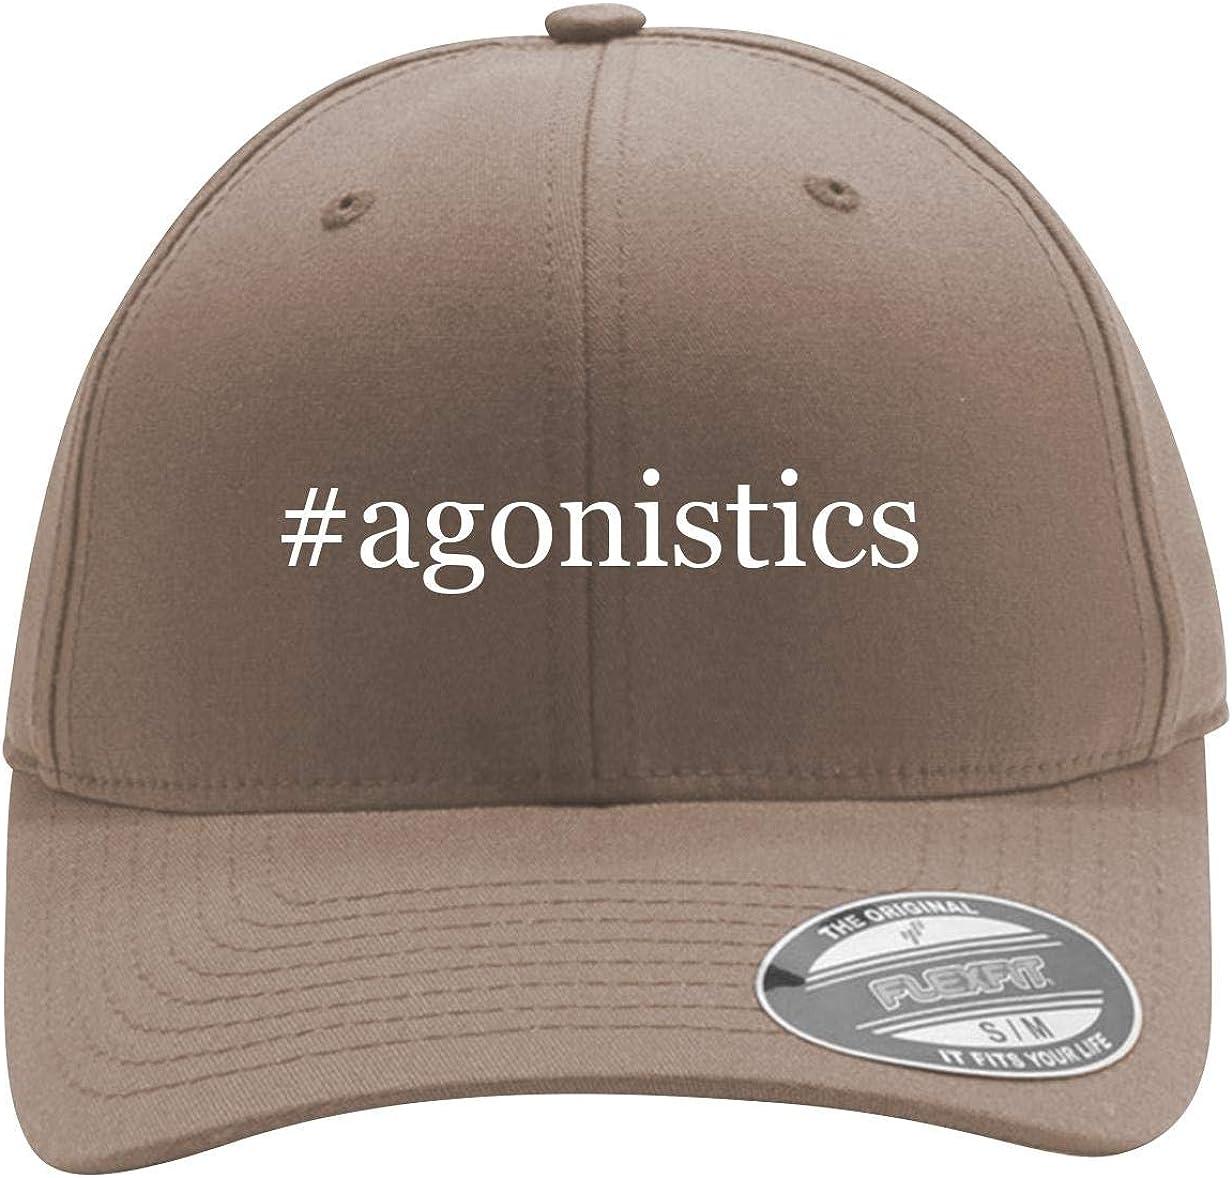 #Agonistics - Men's Hashtag Flexfit Baseball Cap Hat 61eupWeZfIL